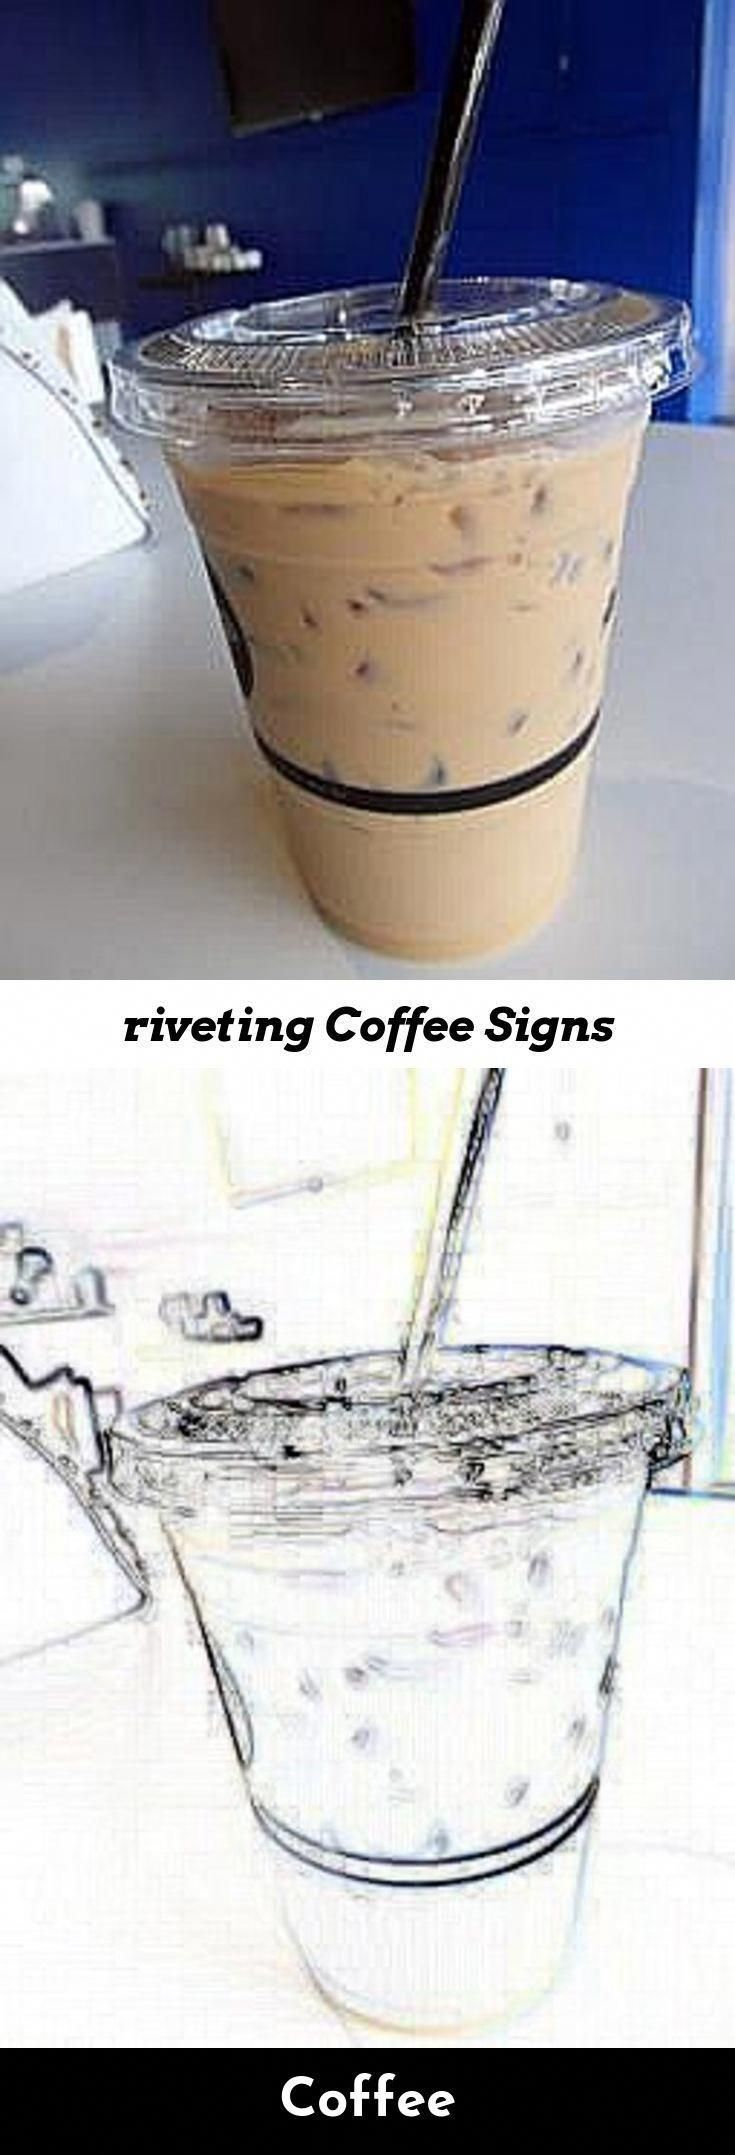 Get it now - jura coffee machine - sumatra coffee beans #juracoffeemachine Get it now - jura coffee machine - sumatra coffee beans #juracoffeemachine Get it now - jura coffee machine - sumatra coffee beans #juracoffeemachine Get it now - jura coffee machine - sumatra coffee beans #juracoffeemachine